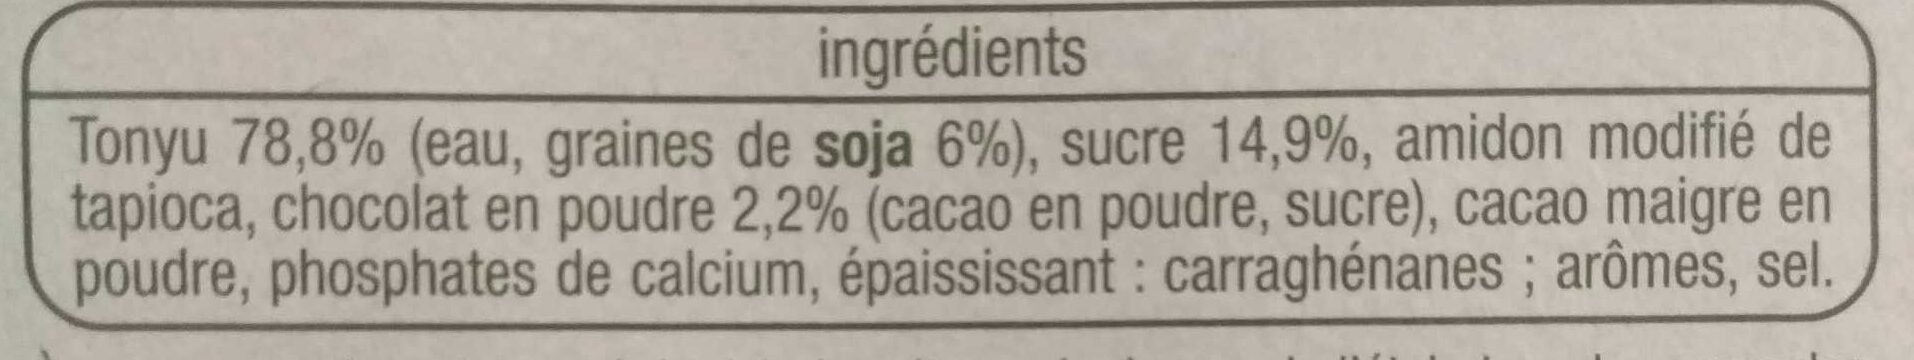 Yaourt au soja chocolat noisette - Ingrédients